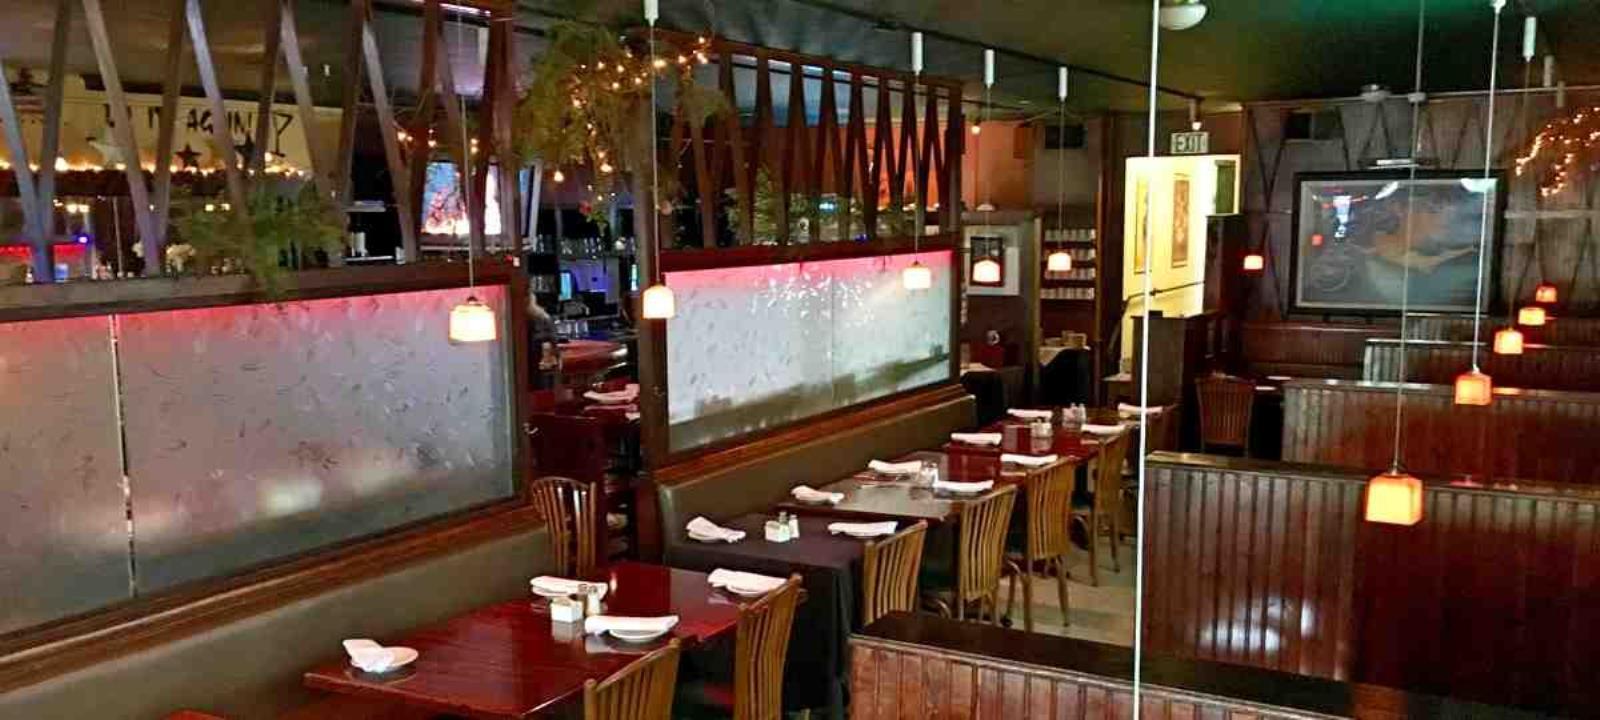 Bistro 185 Restaurant - Picture